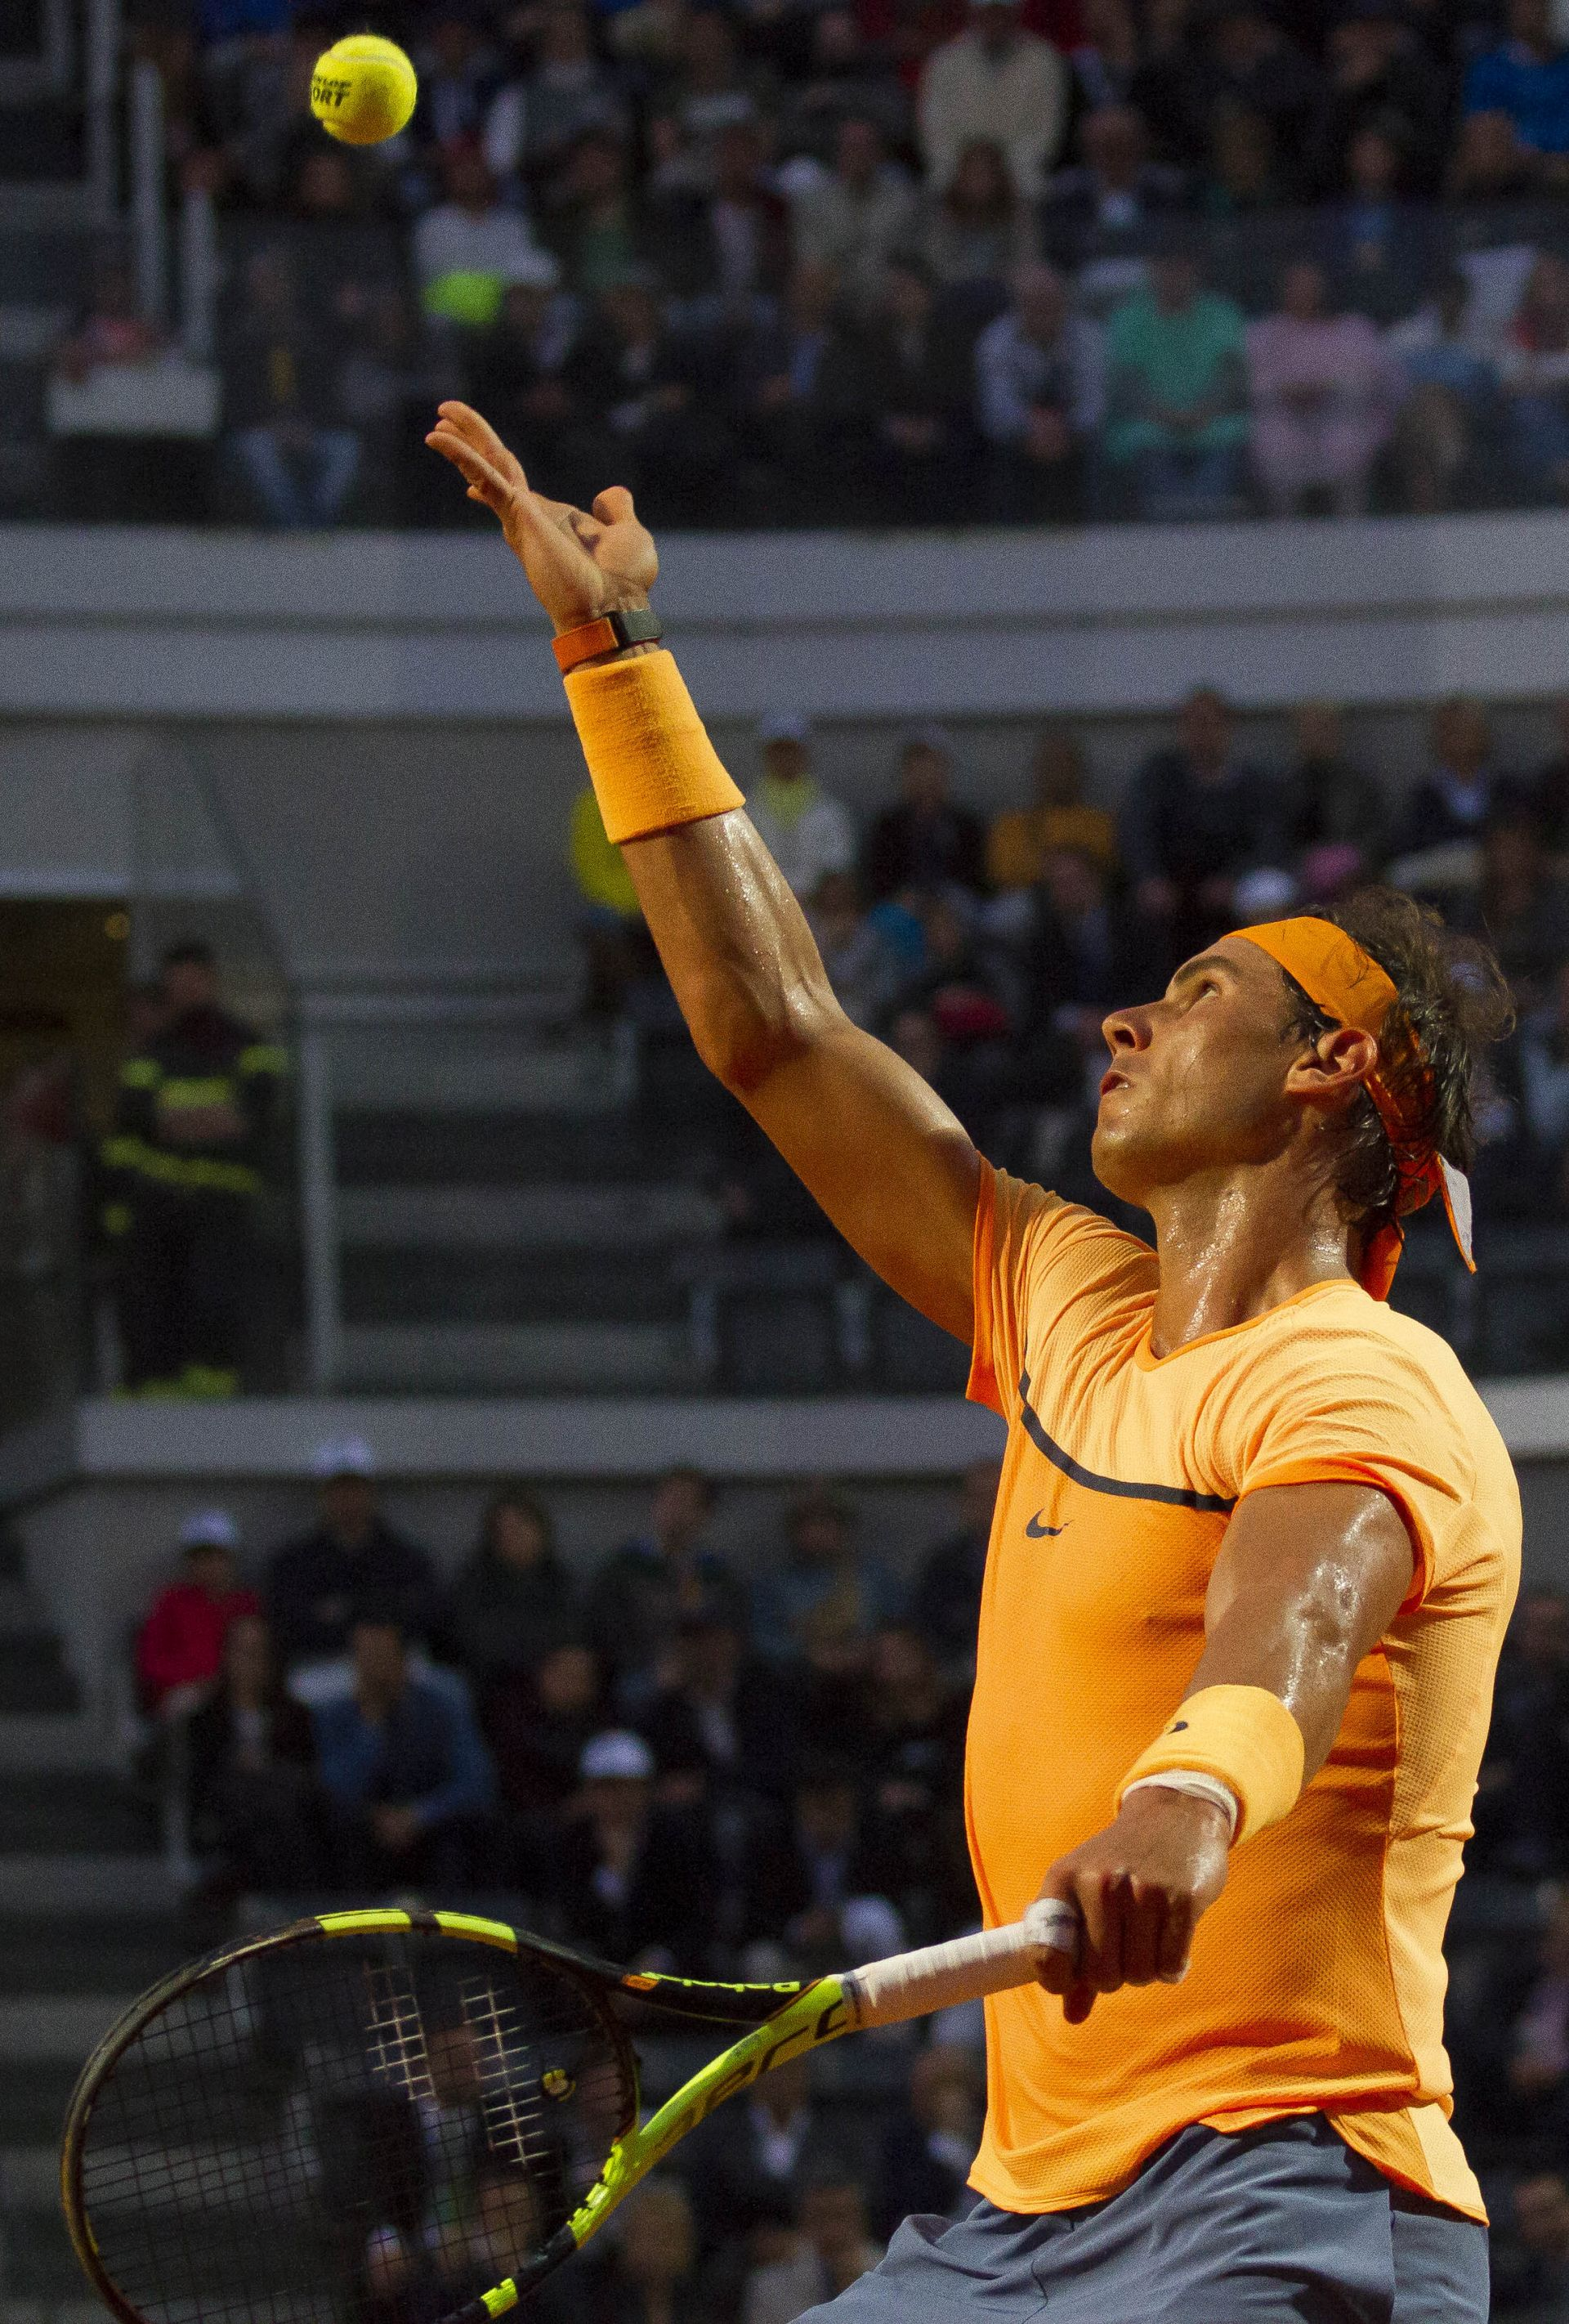 OZLJEDA U ROLAND GARROSU: Nadal otkazao nastup u Queen's Clubu